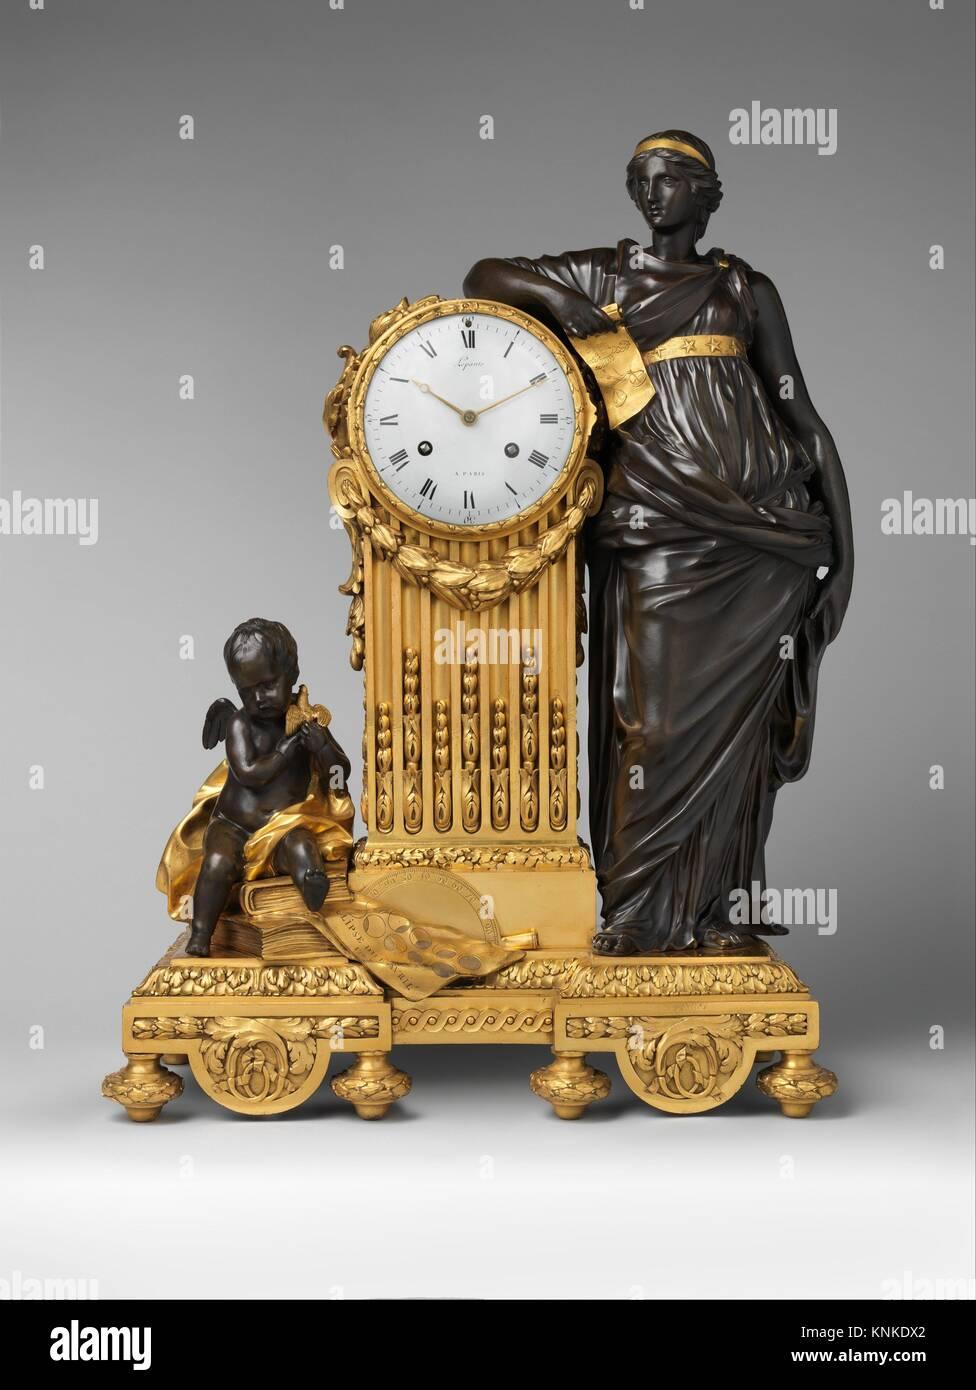 Mantel clock (Pendule Uranie). Maker: Clockmaker: Jean-André Lepaute (French, 1720-1789); Maker: Clockmaker: - Stock Image